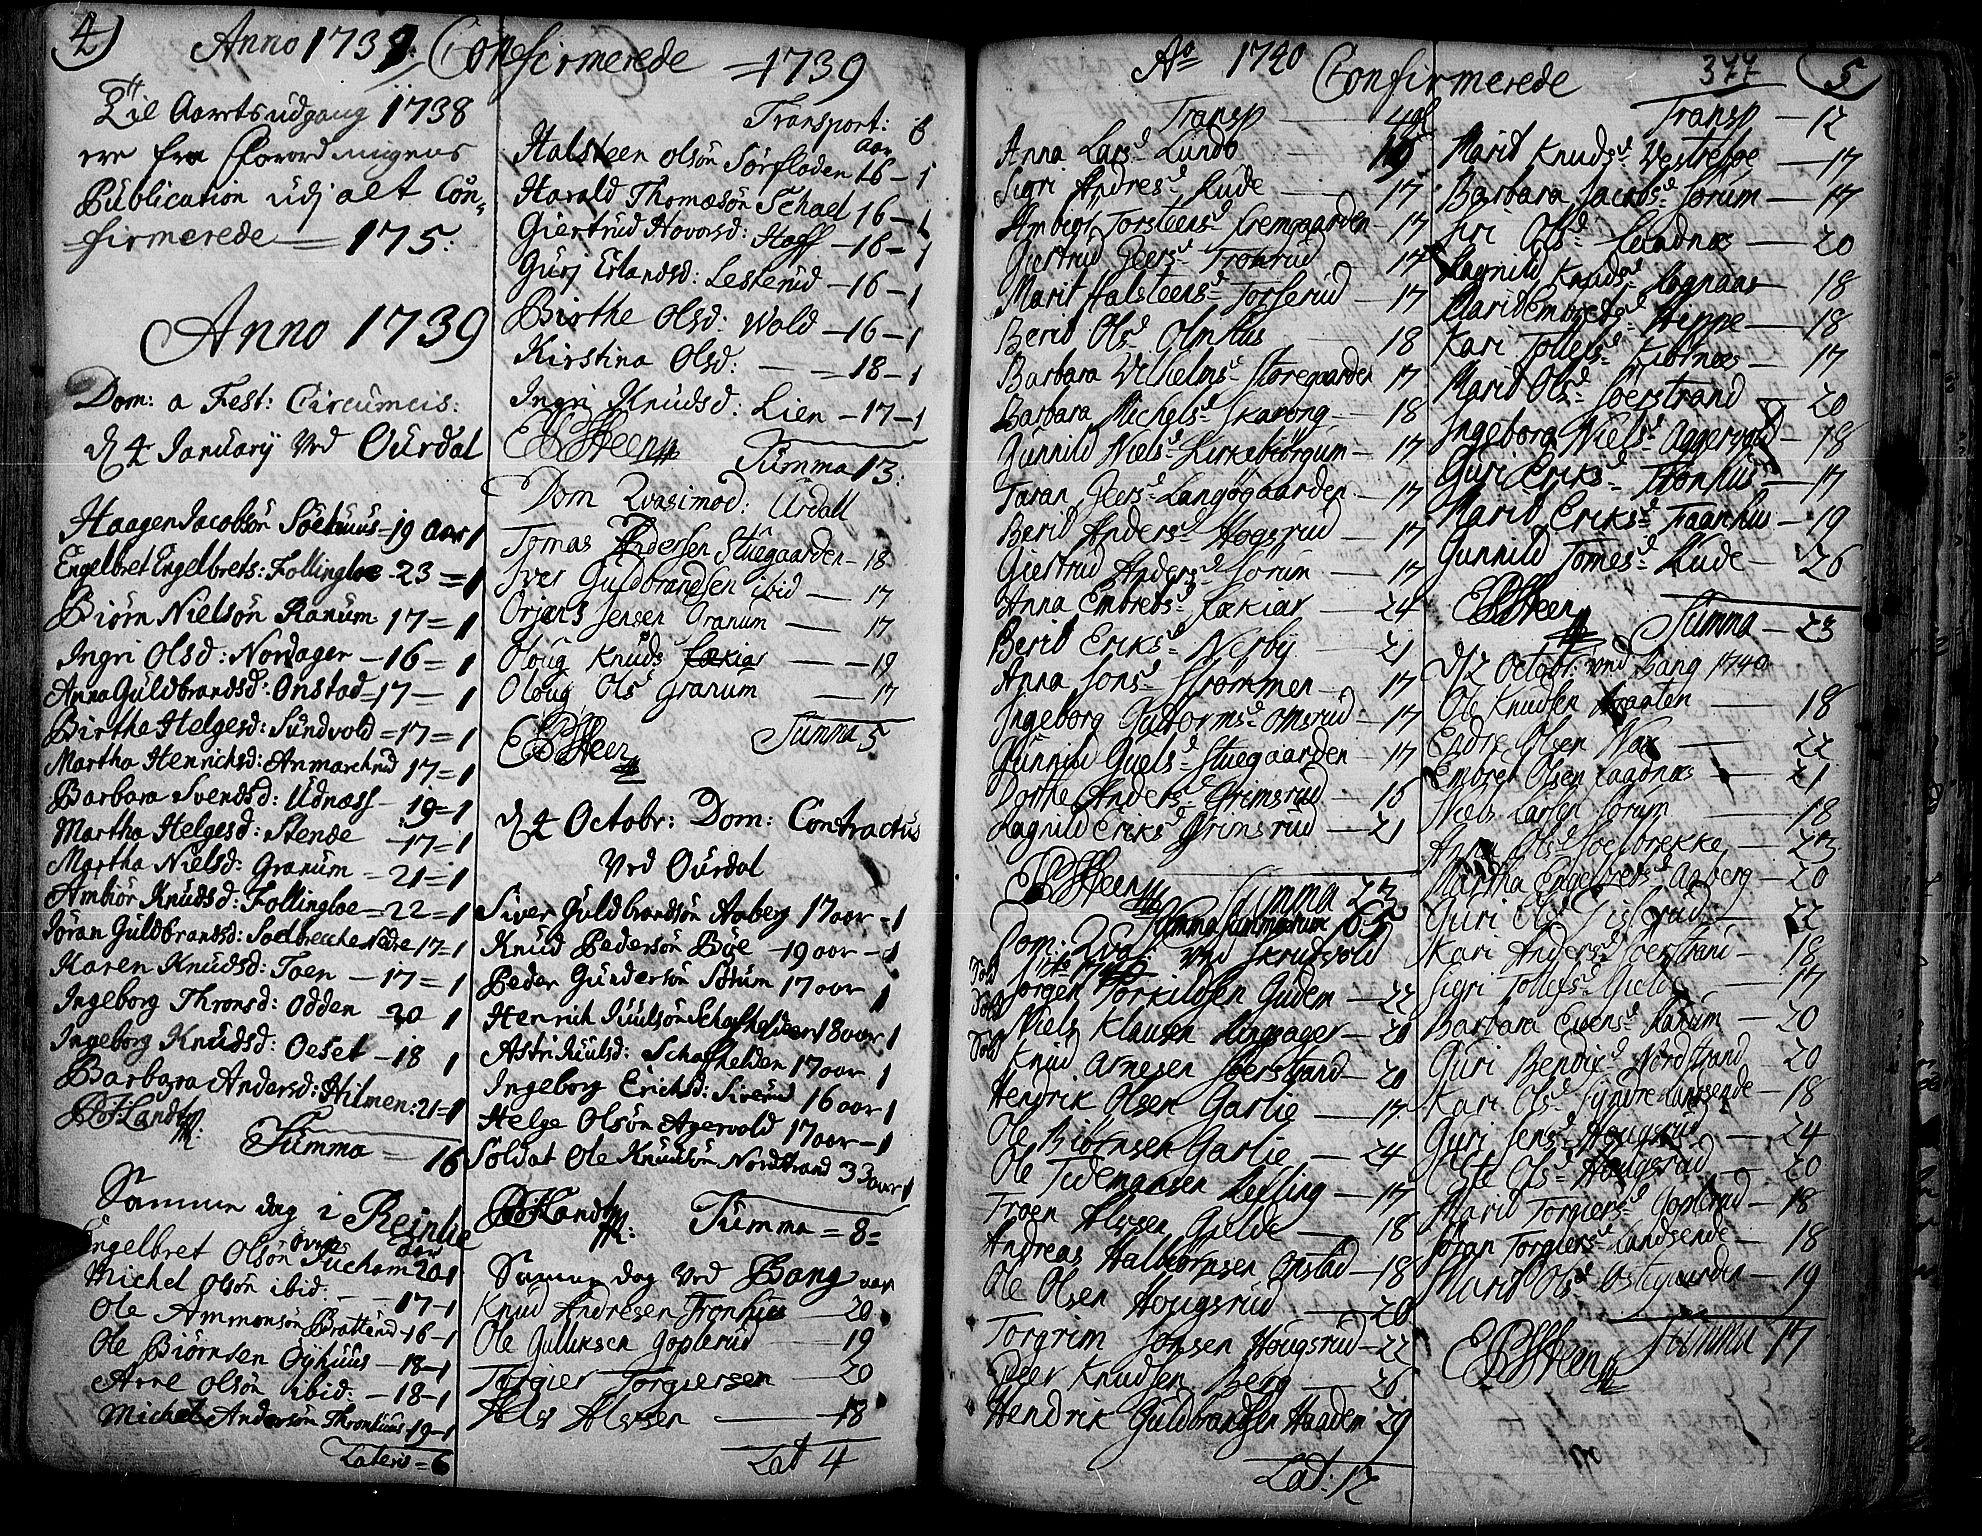 SAH, Aurdal prestekontor, Ministerialbok nr. 4, 1730-1762, s. 4-5